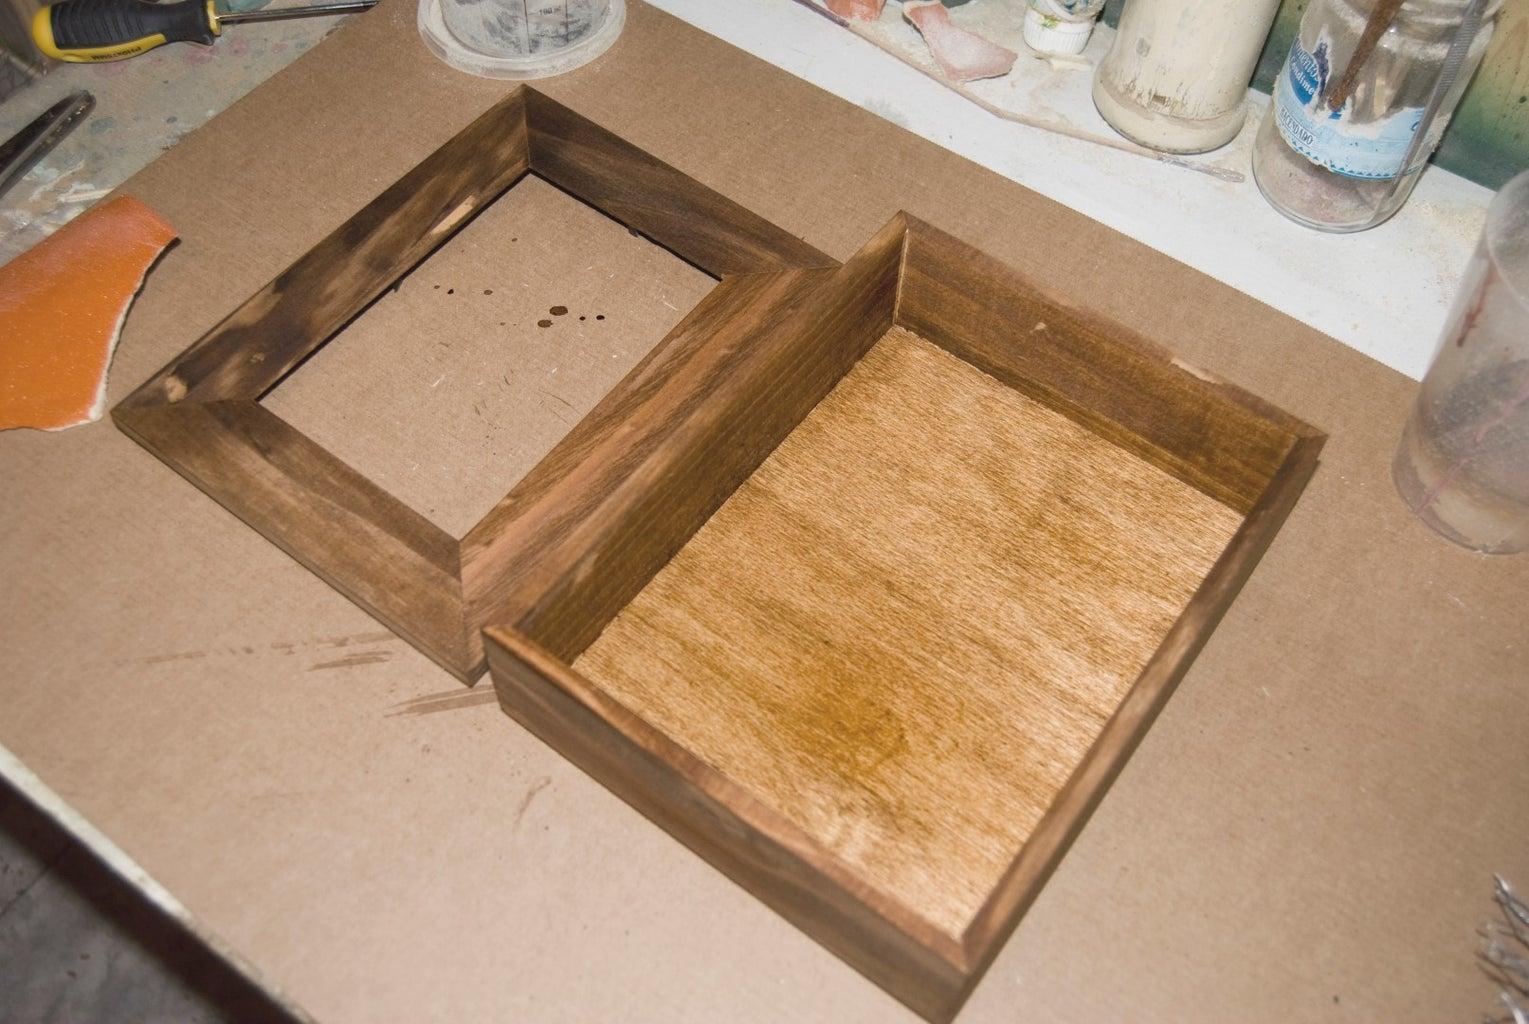 Step 4: Wood Dyeing